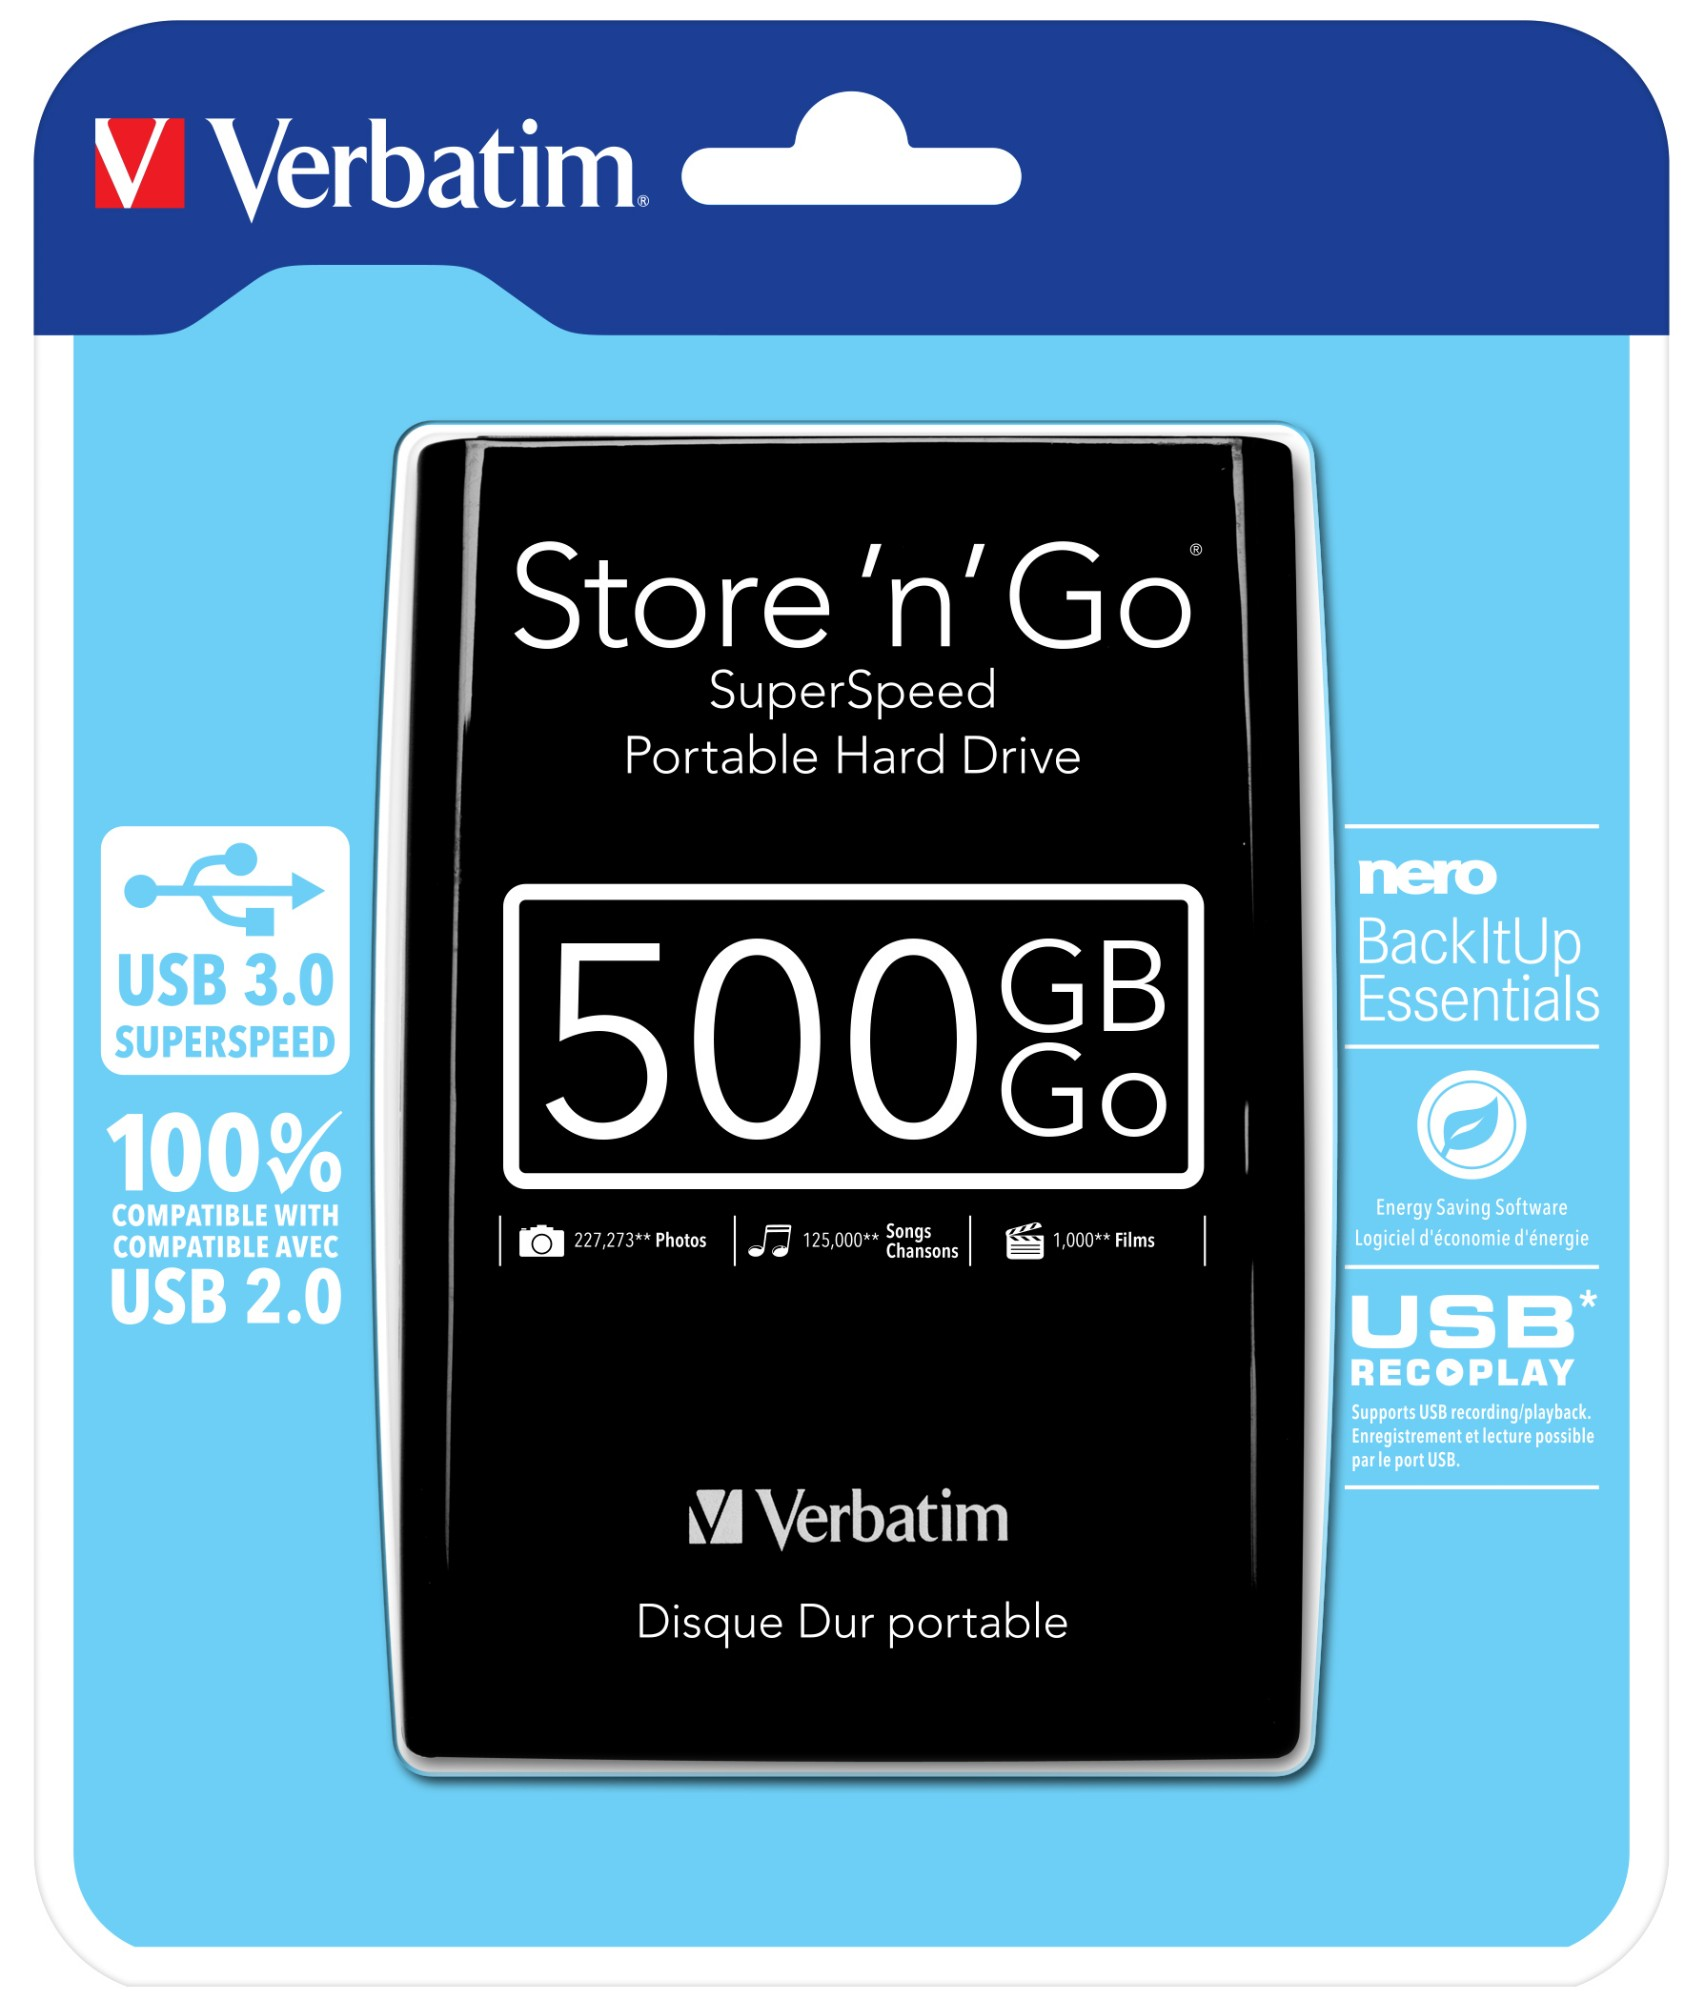 Verbatim VB-25U3-500G01